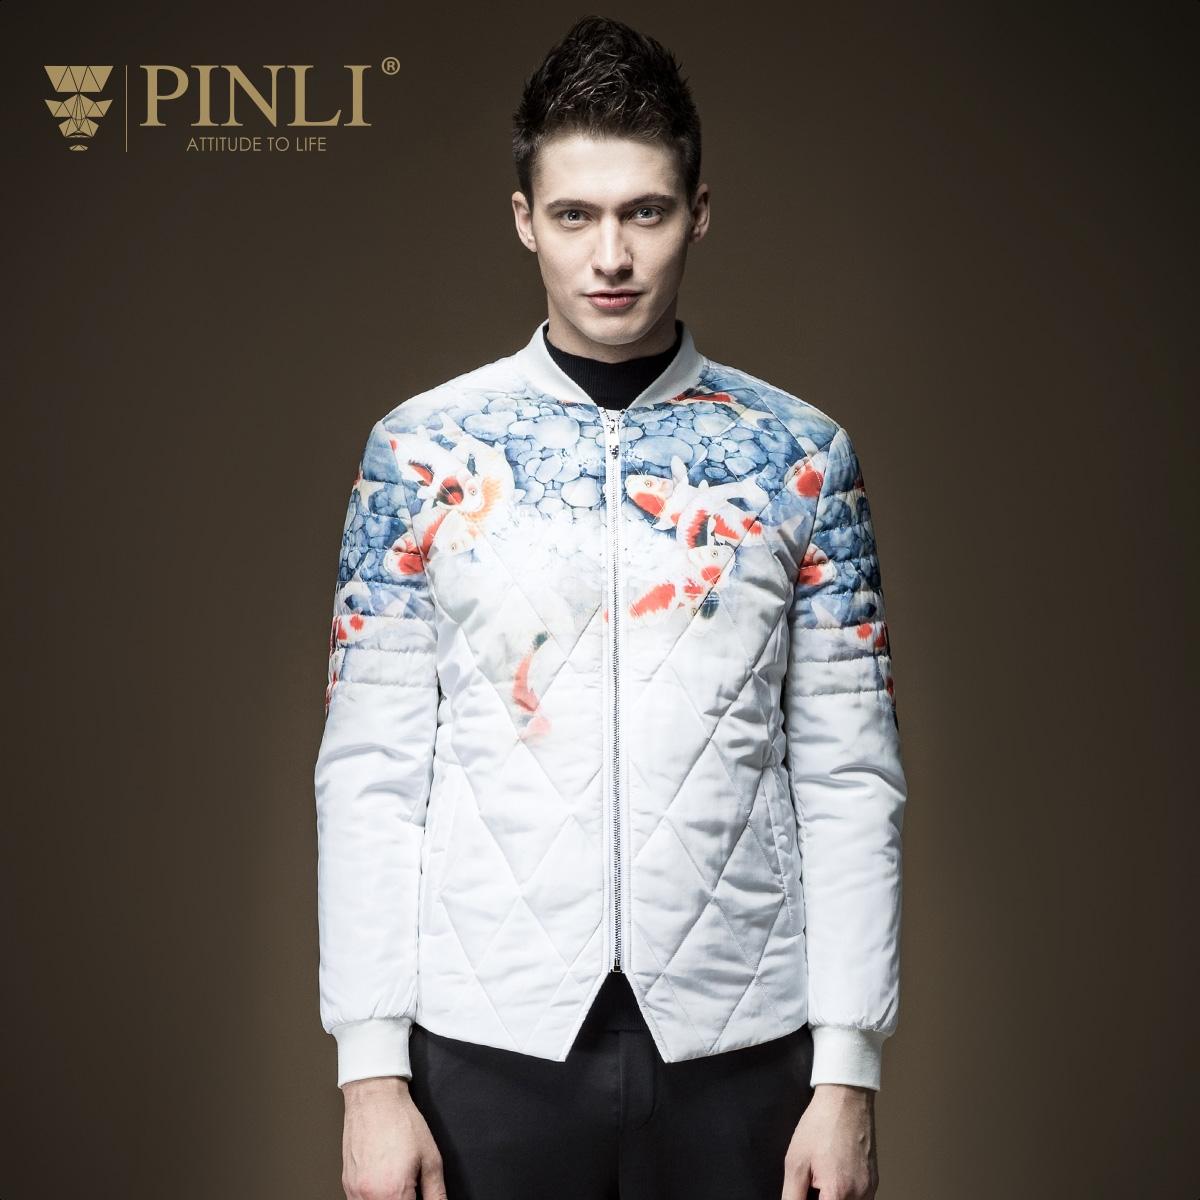 67.05$  Buy now - http://aliy17.worldwells.pw/go.php?t=32783079939 - Winter Jacket Men Real Acetate Regular Ruffled Pinli 2016 New Men's Baseball Coat Collar Male B164305201